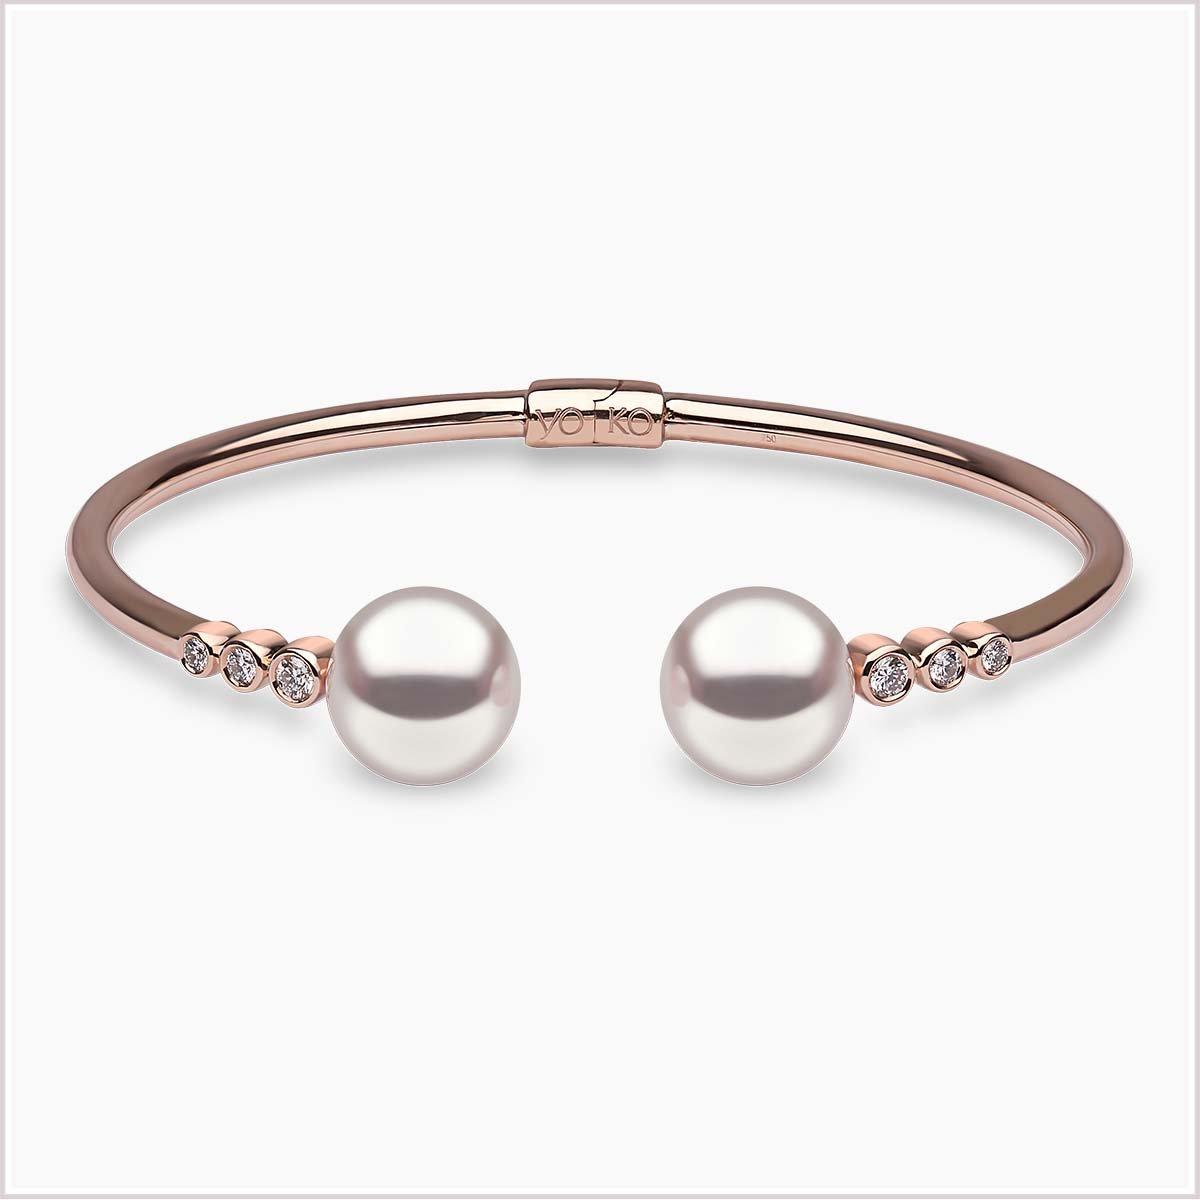 Yoko London Novus Diamond and Pearl Bracelet